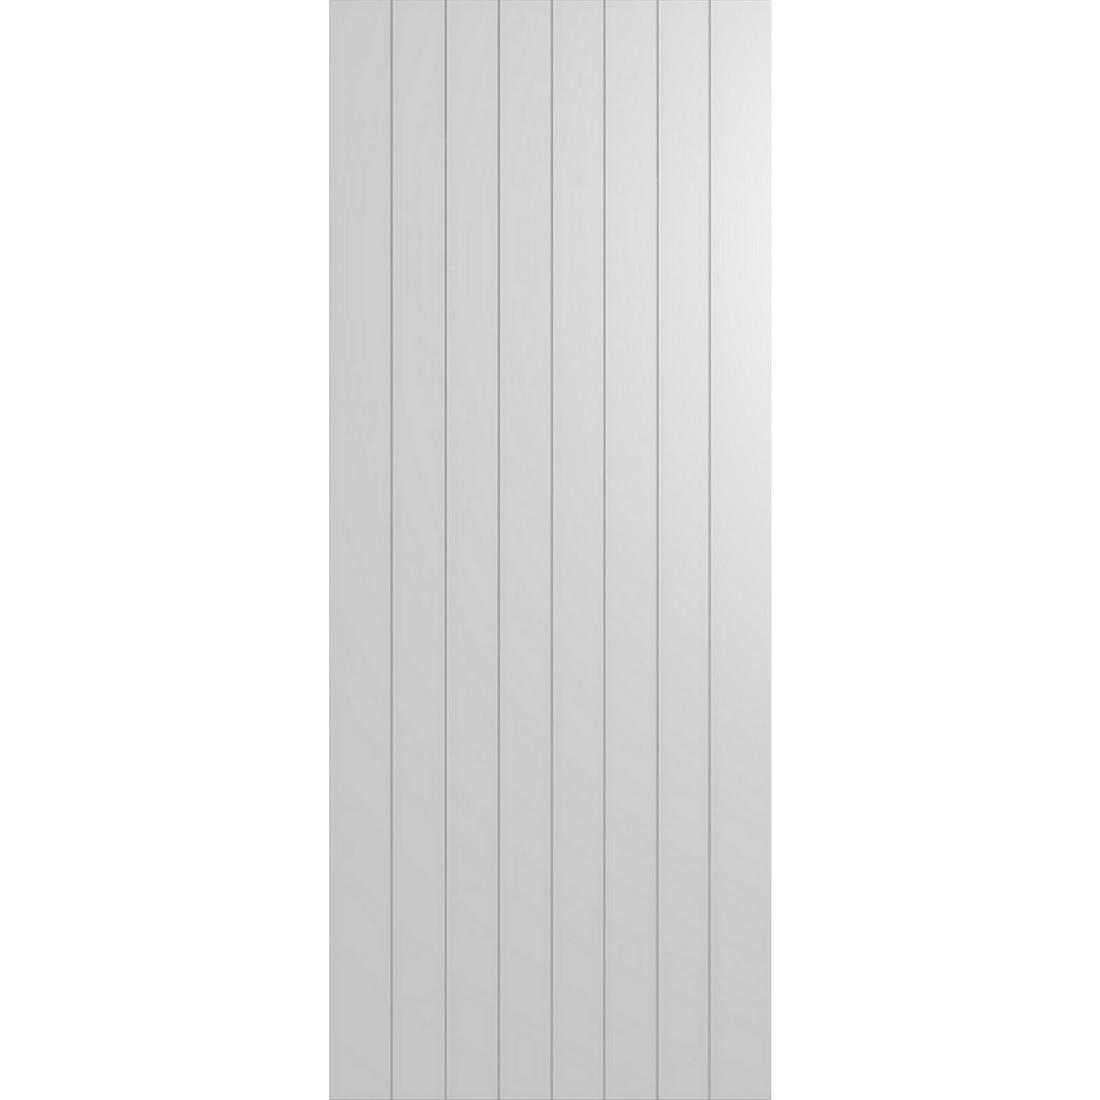 Doors Accent HAG11 Interior Door 1980 x 710 x 35mm Hollow Core Pre-Primed MDF Skin HAG11710